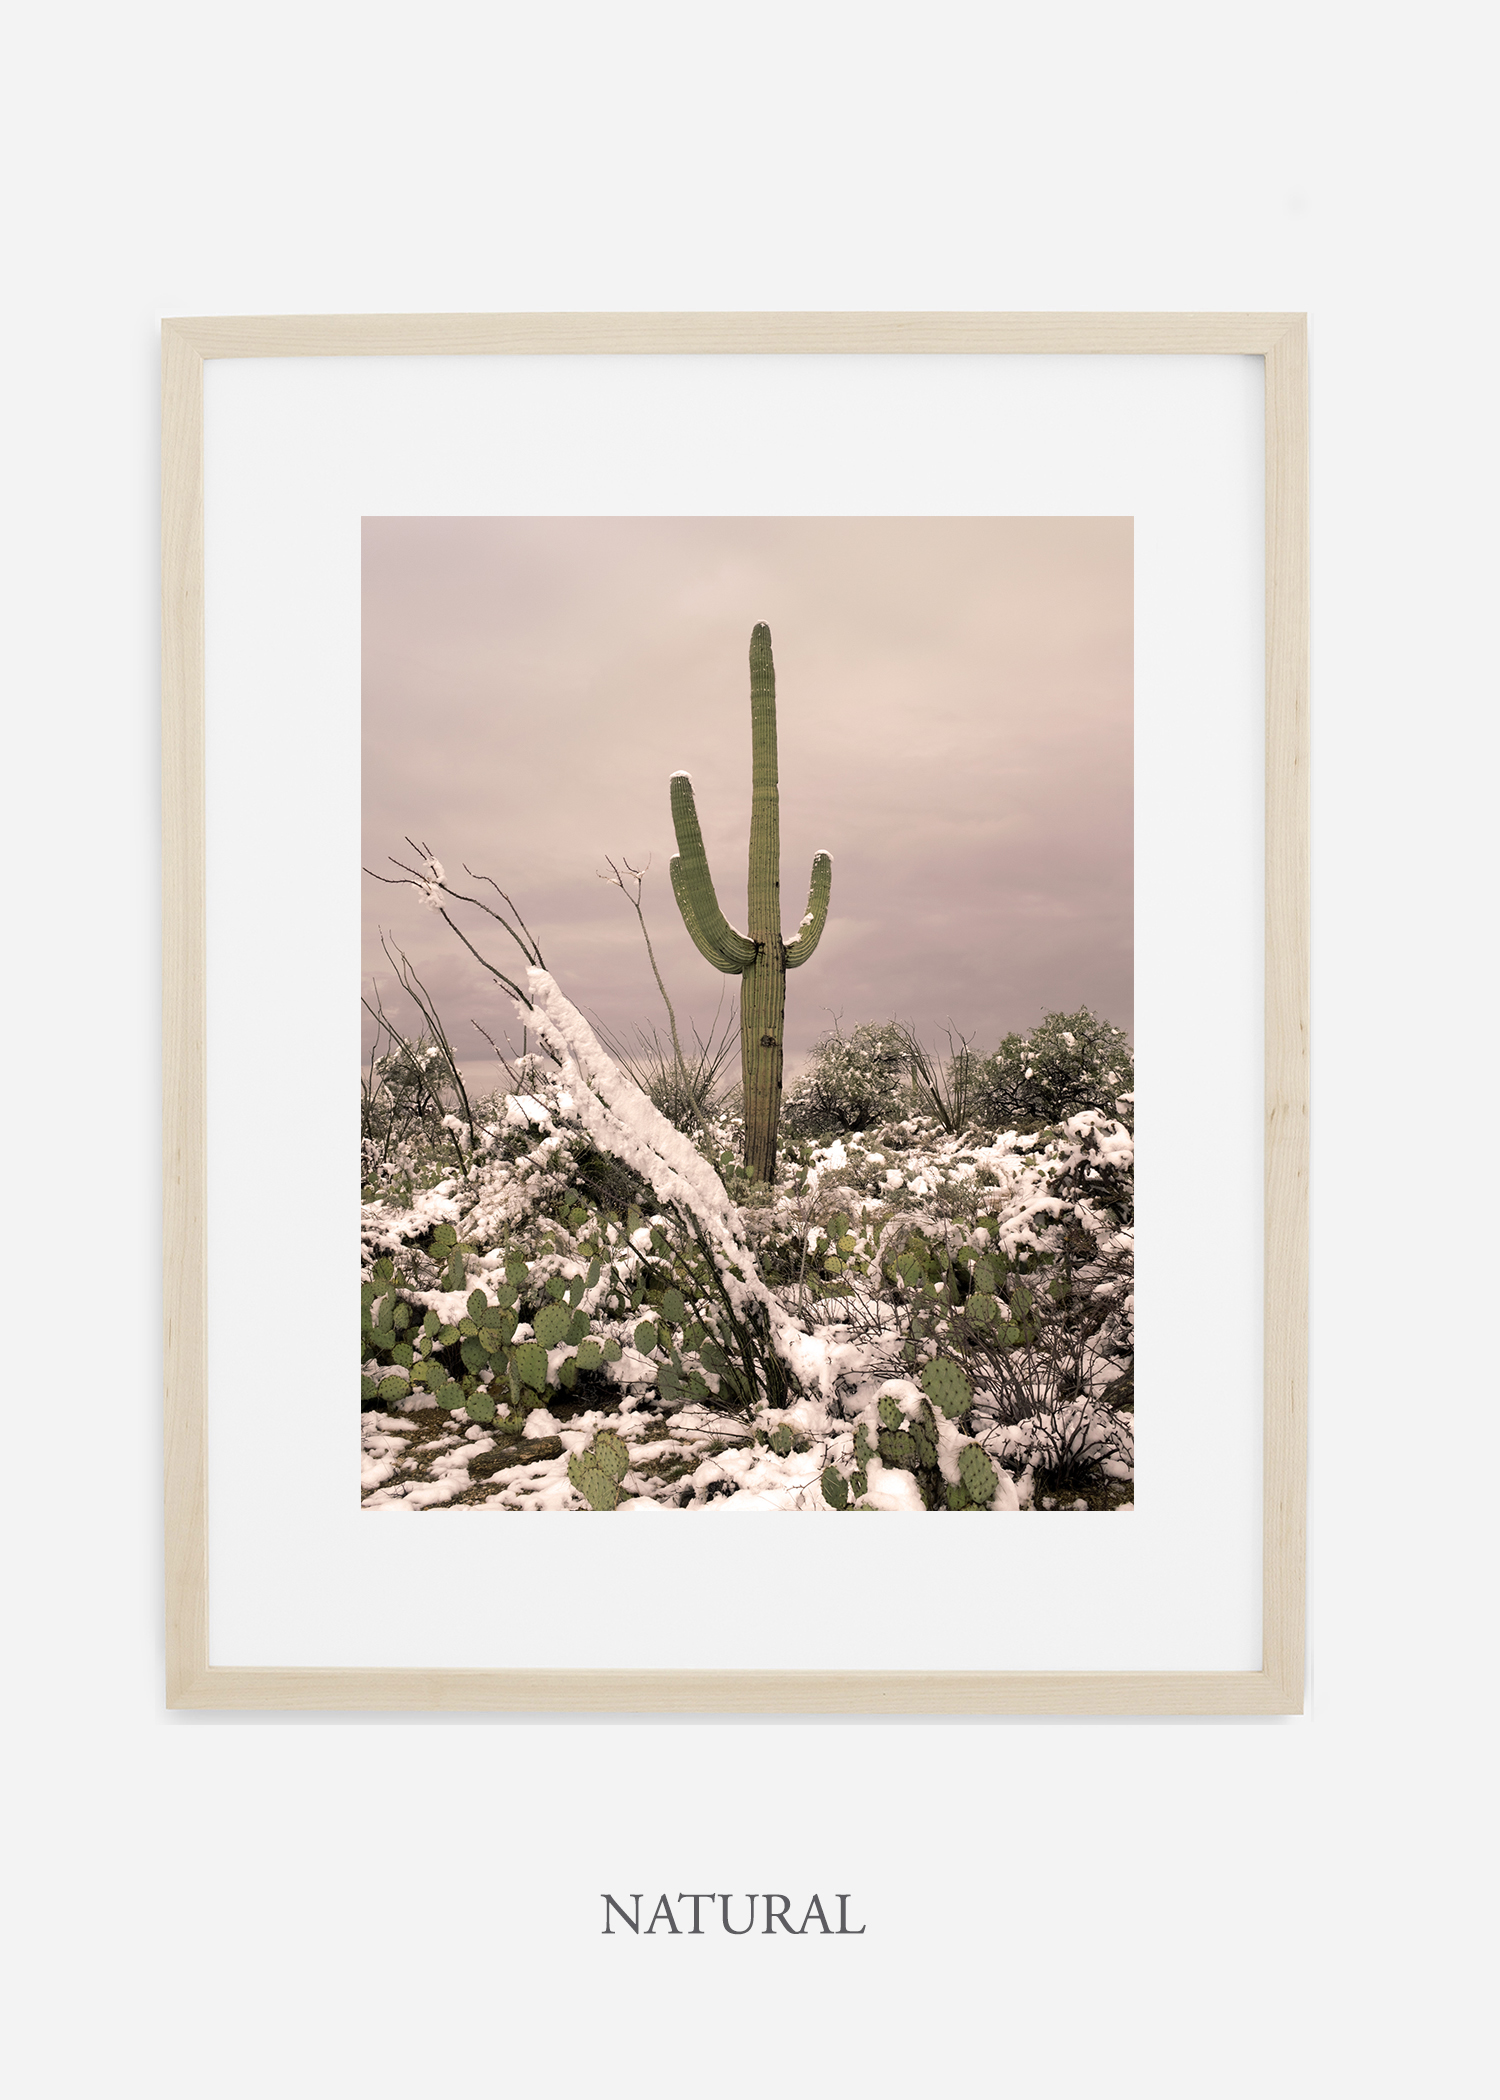 naturalframe-saguaroNo.4-wildercalifornia-art-wallart-cactusprint-homedecor-prints-arizona-botanical-artwork-interiordesign.jpg